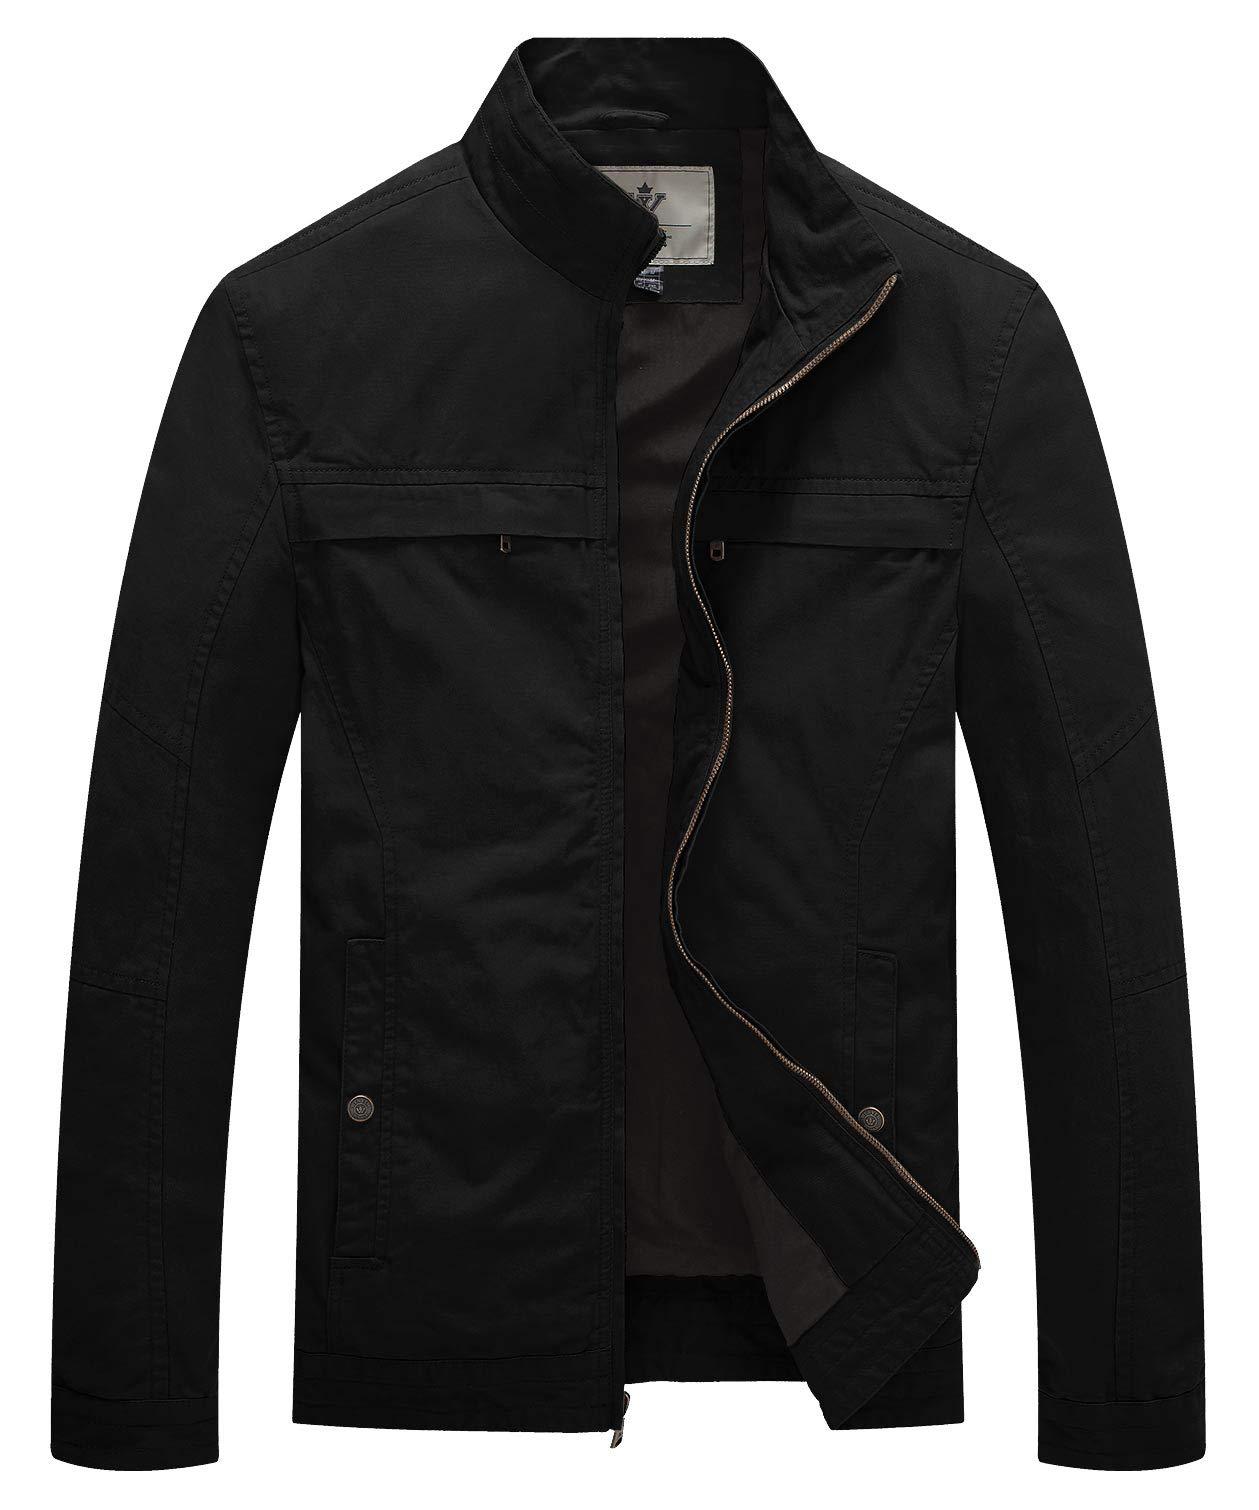 WenVen Men's Stand Collar Lightweight Military Jacket(Black,Large) by WenVen